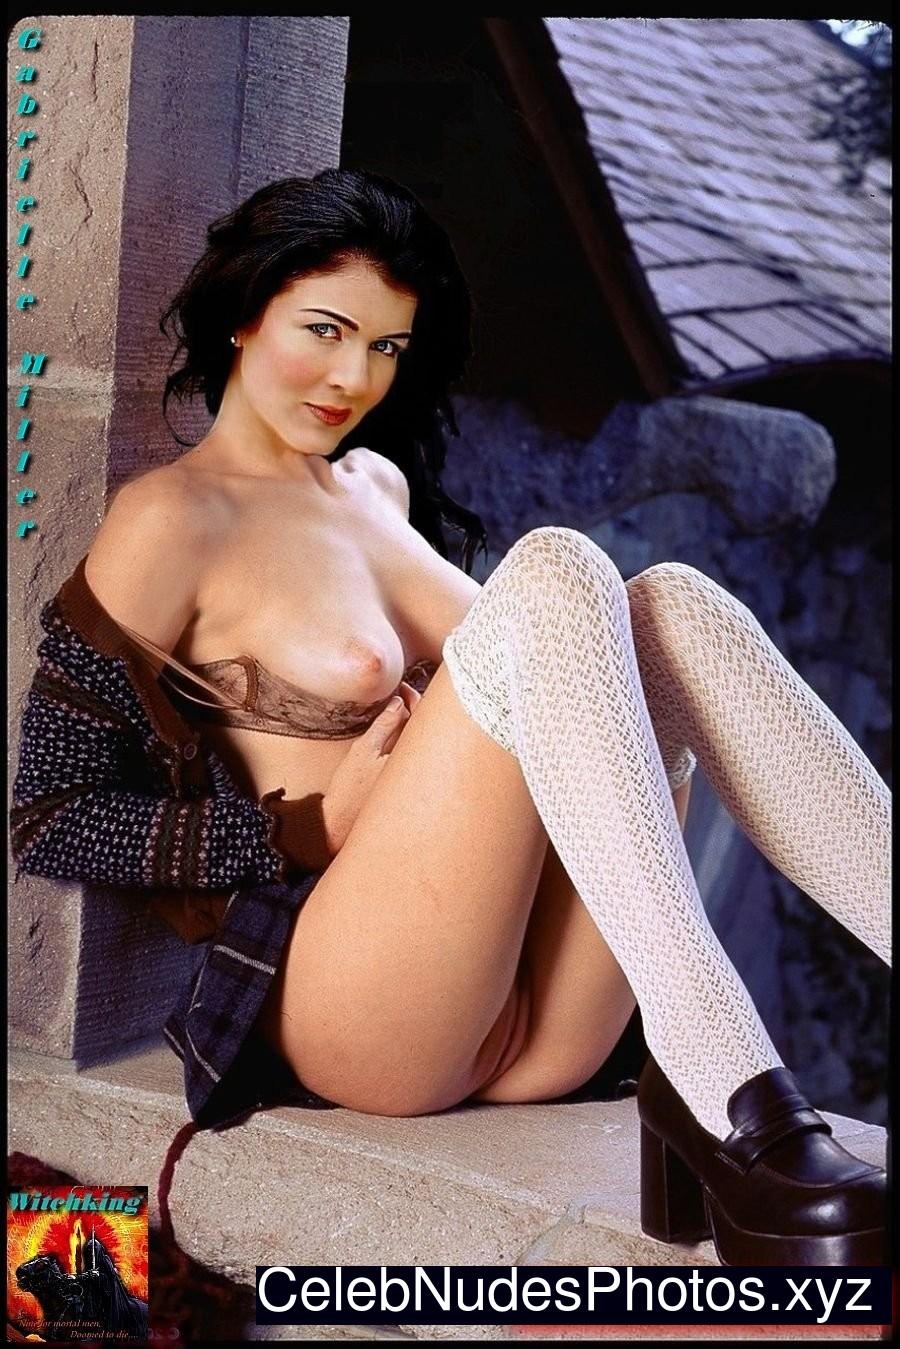 gabrielle love nude pic